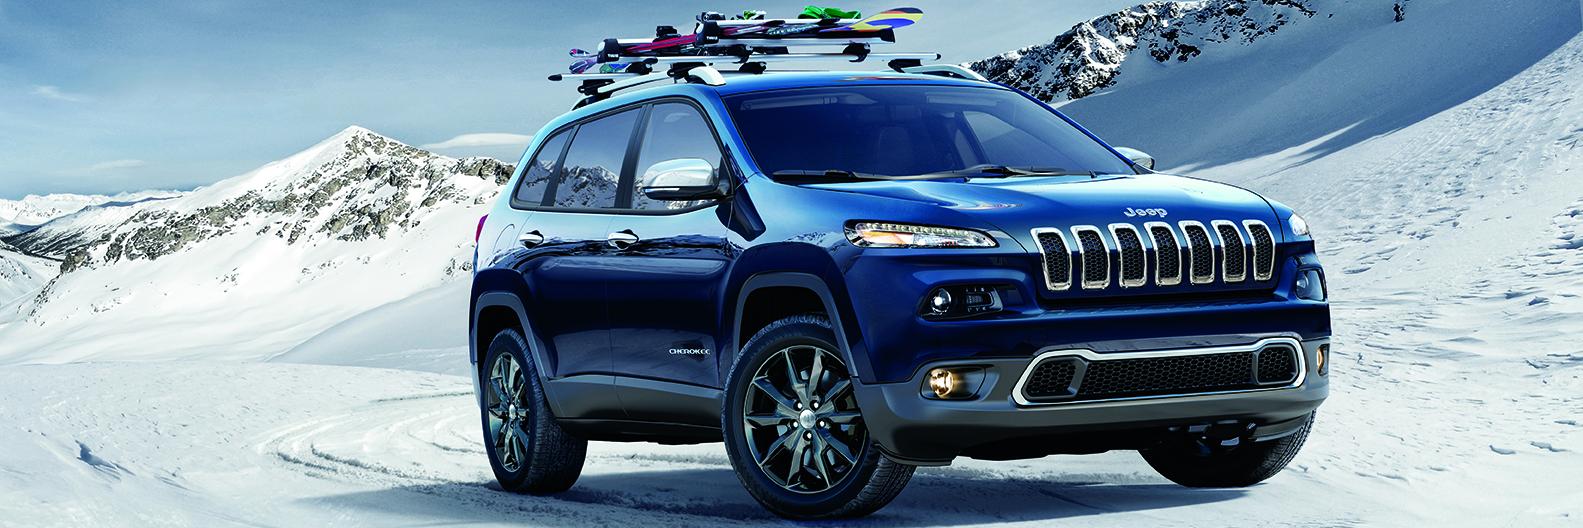 2017 Jeep Cherokee Technology